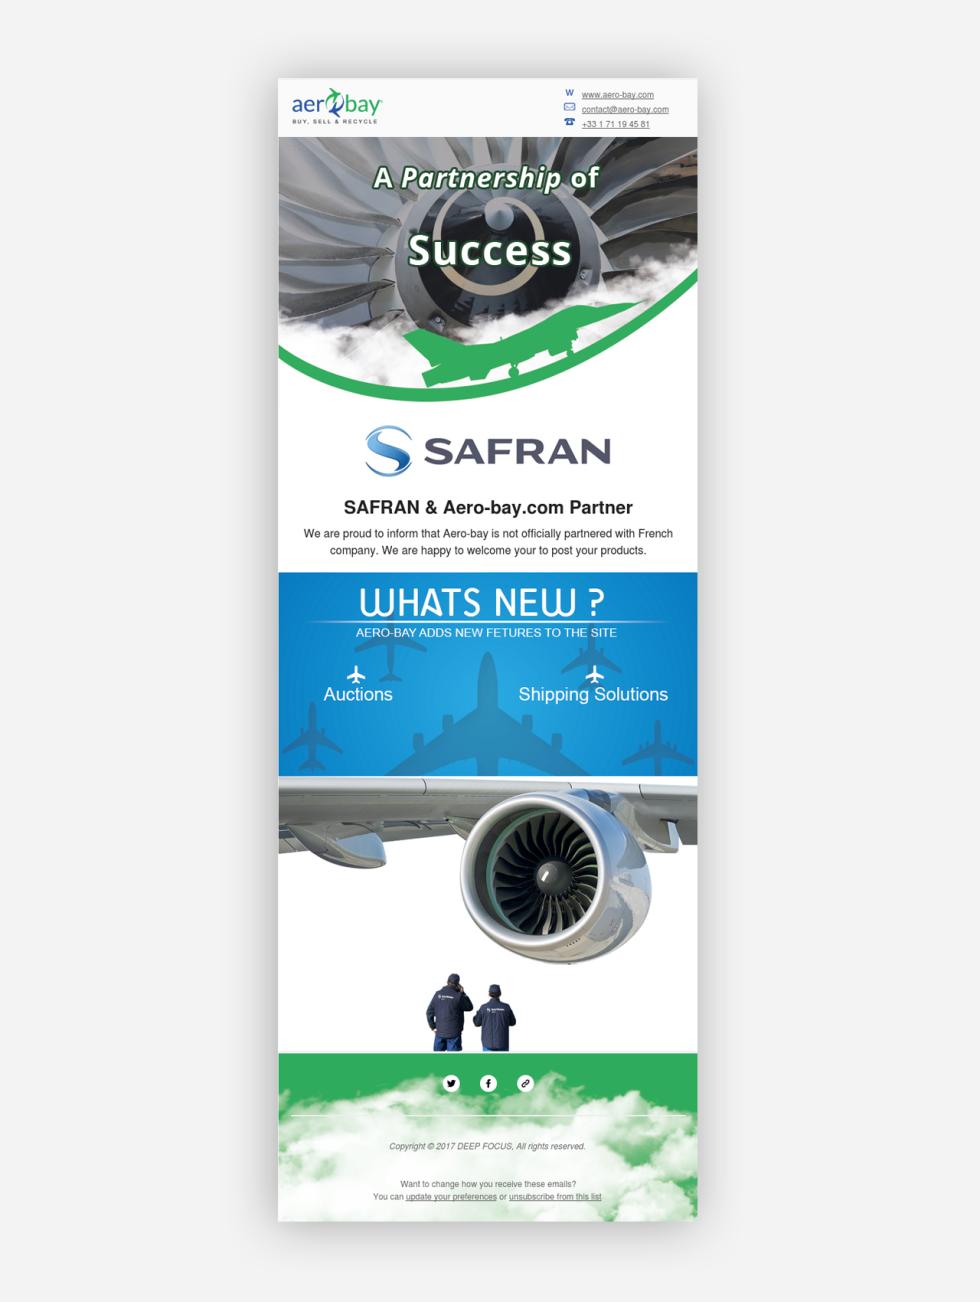 Image of Aerobay newsletter